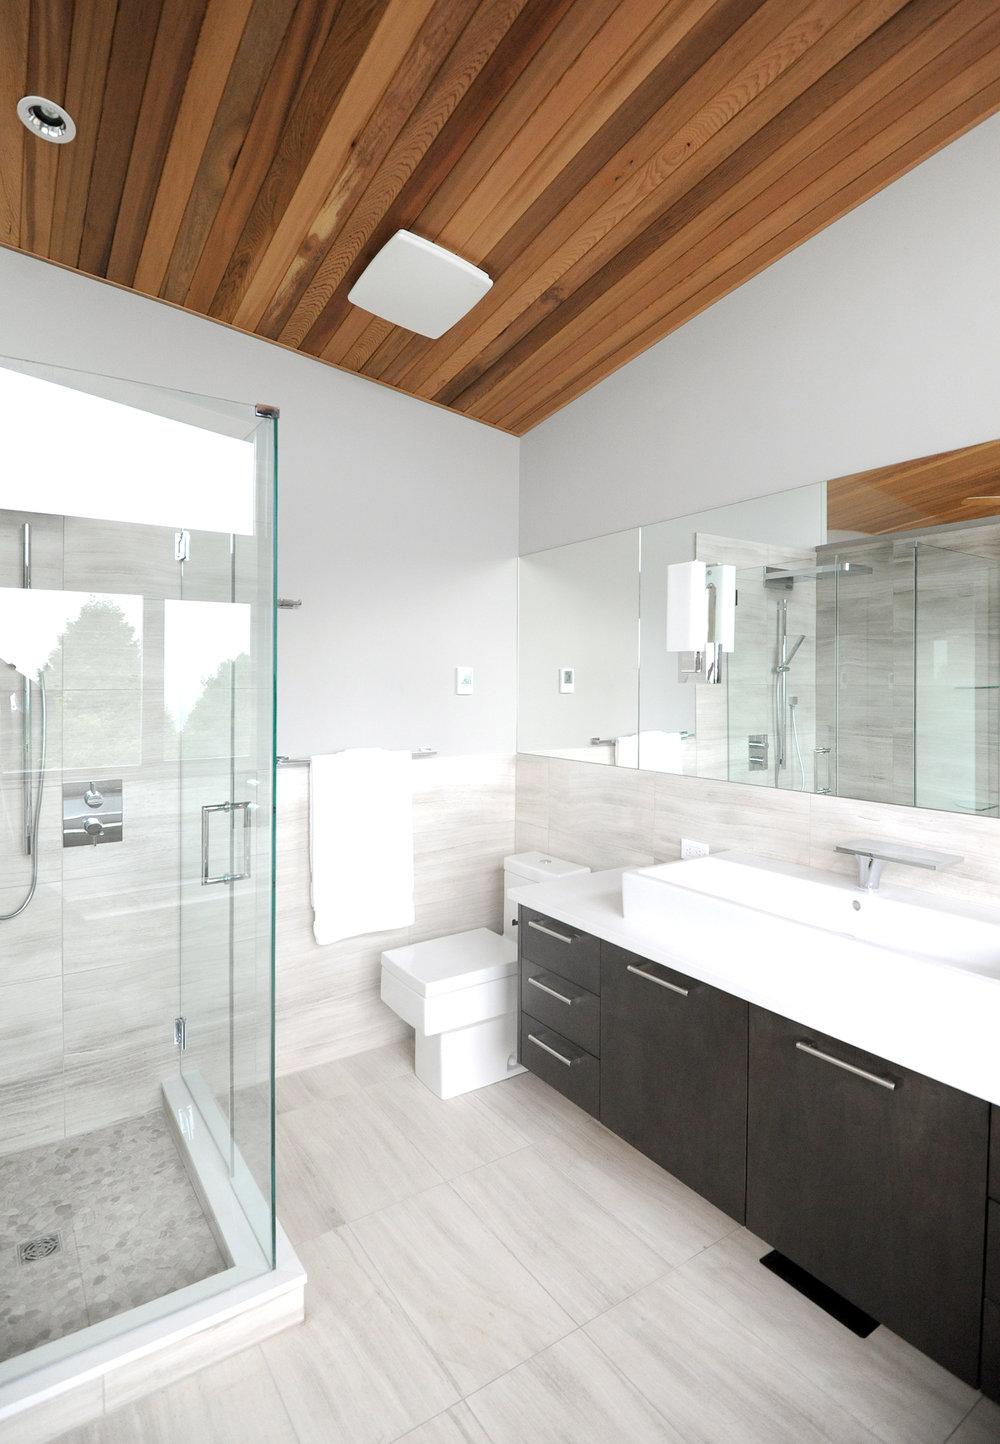 turkel_modern_design_prefab_home_west_vancouver_bathroom.jpg